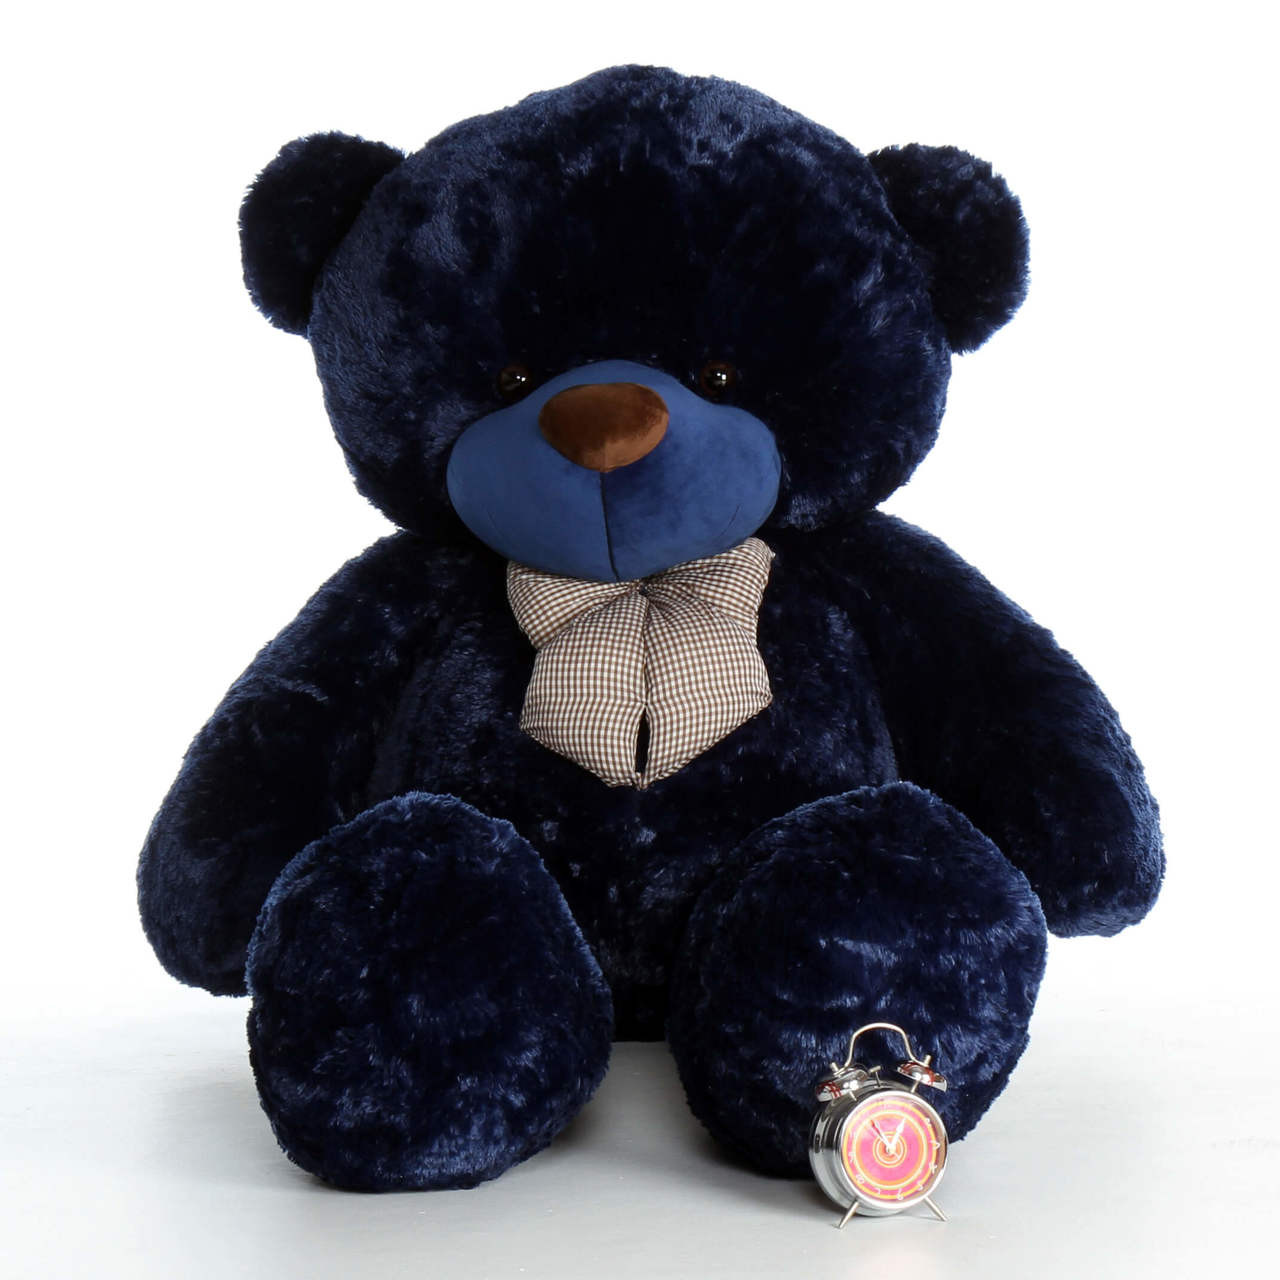 Life Size Navy Blue Teddy Bear Royce Cuddles